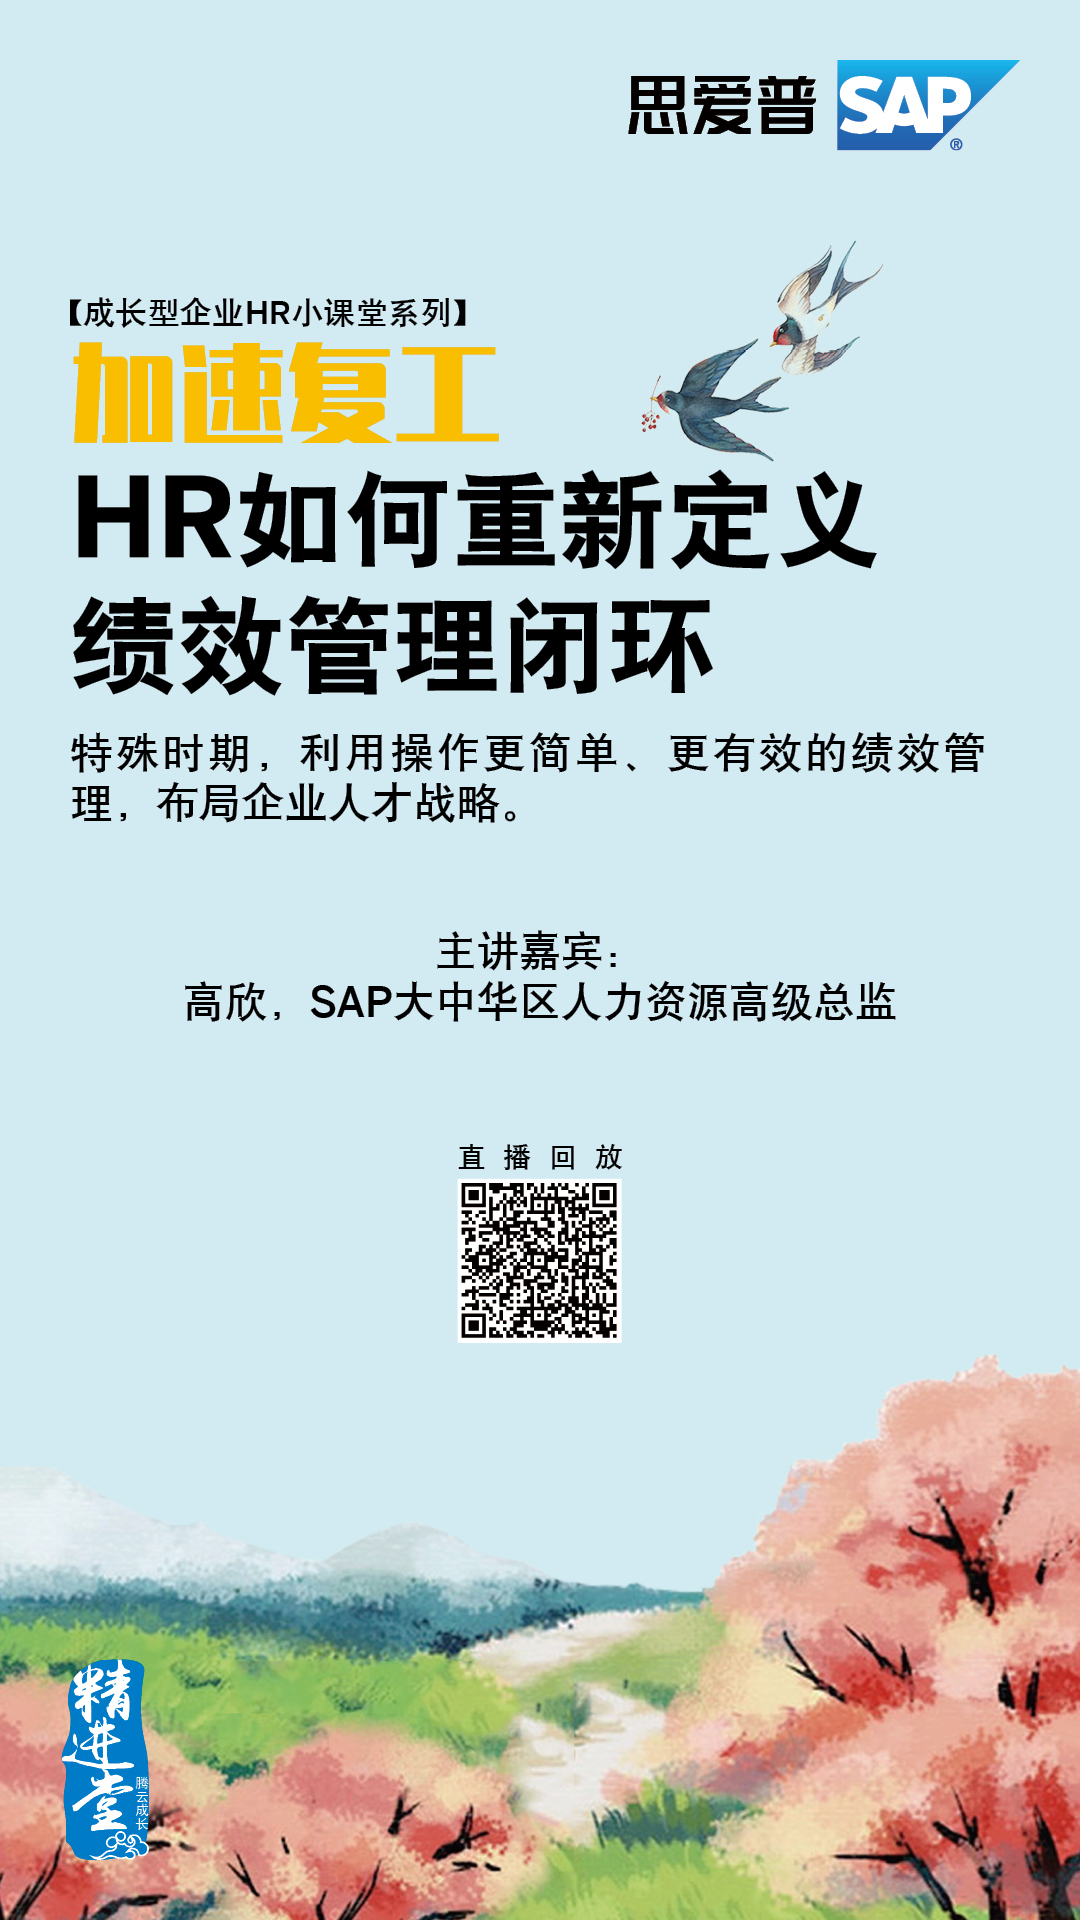 HR重新定义绩效管理.jpg